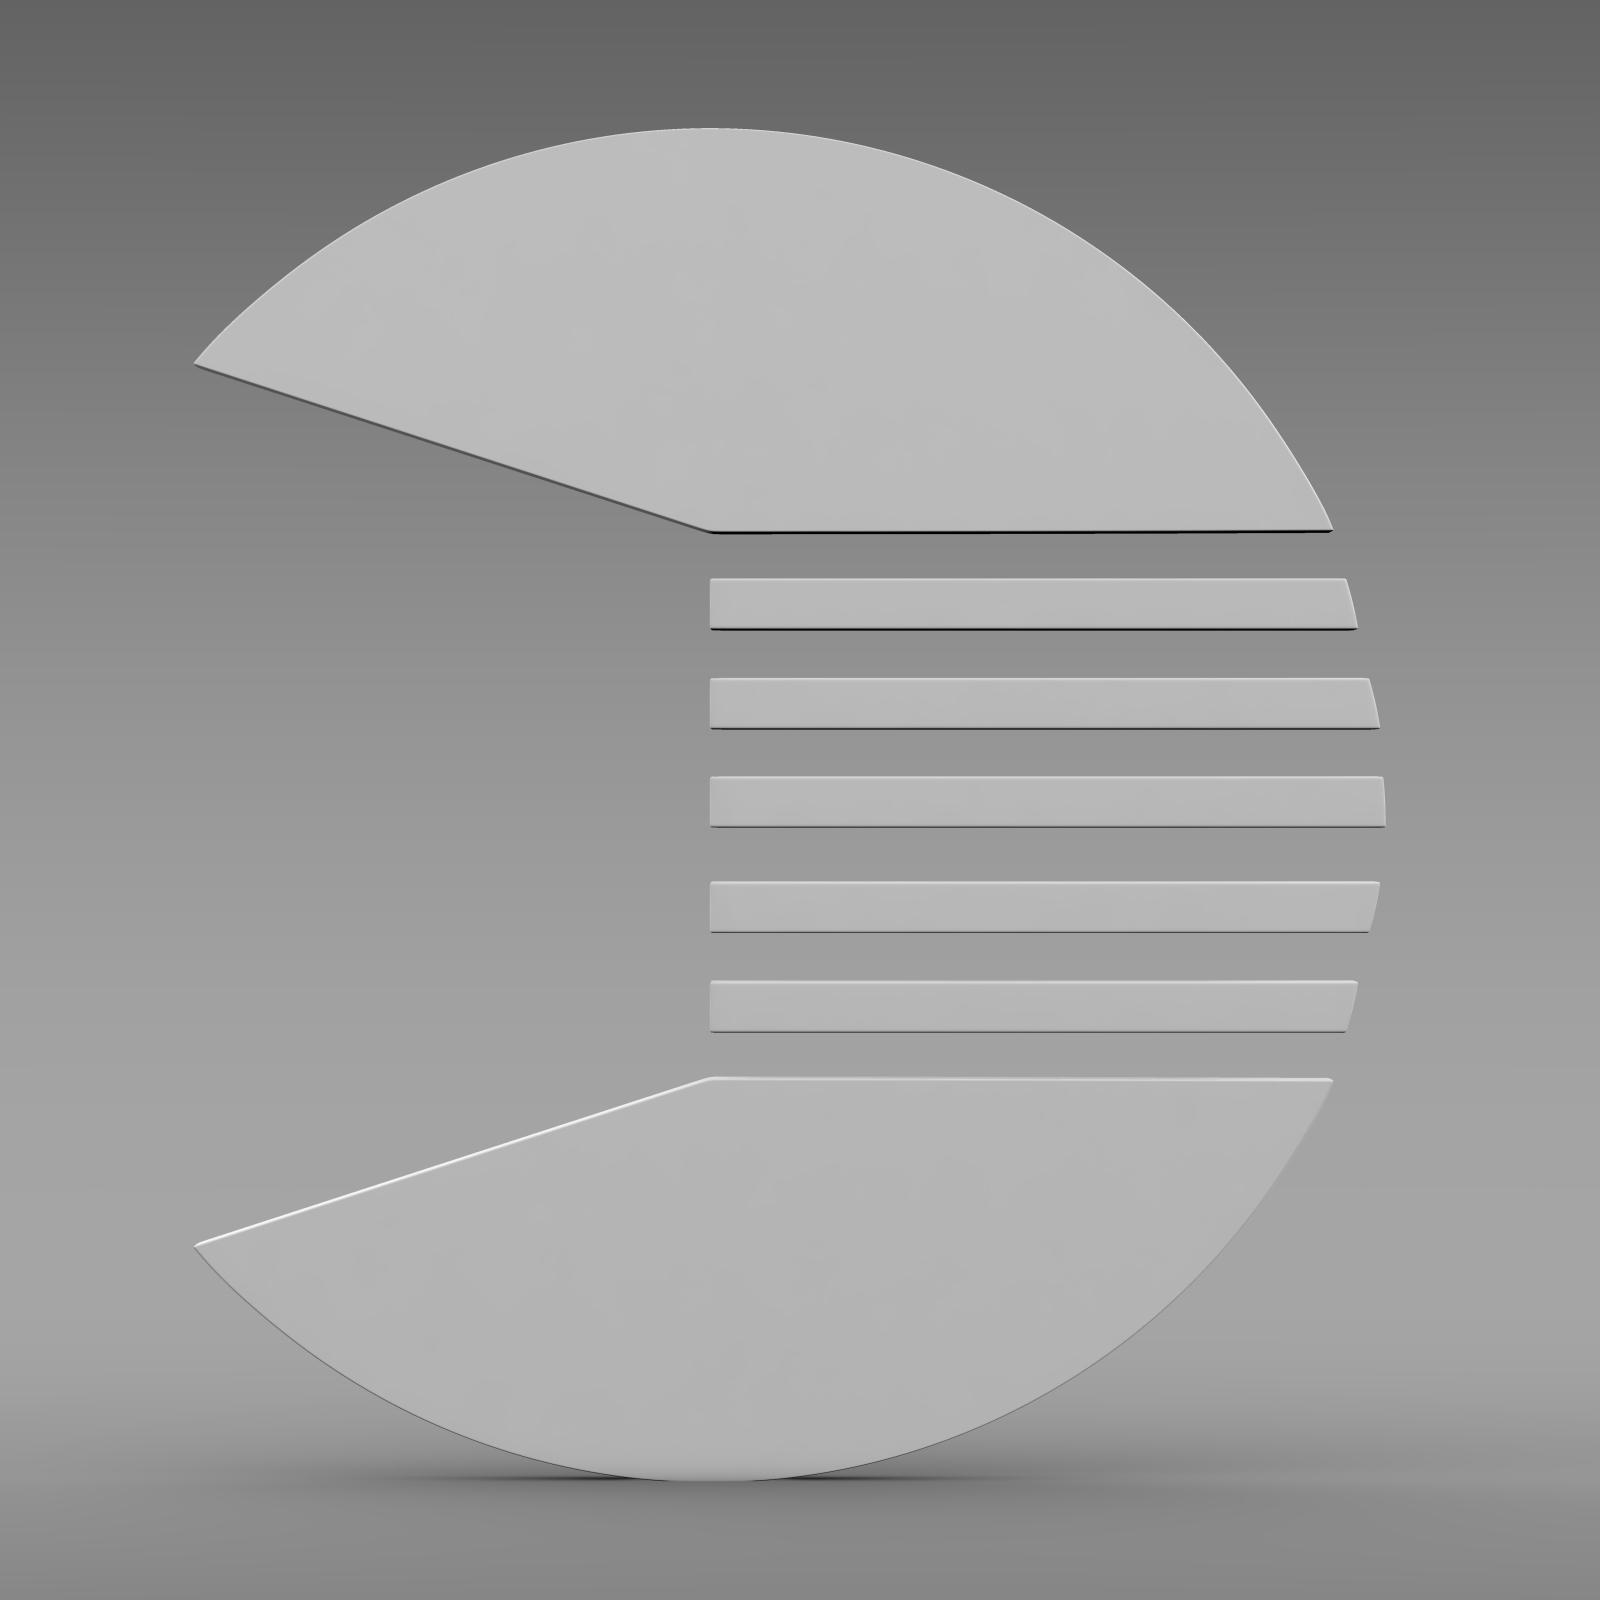 quant logo 3d model 3ds max fbx c4d lwo ma mb hrc xsi obj 213260